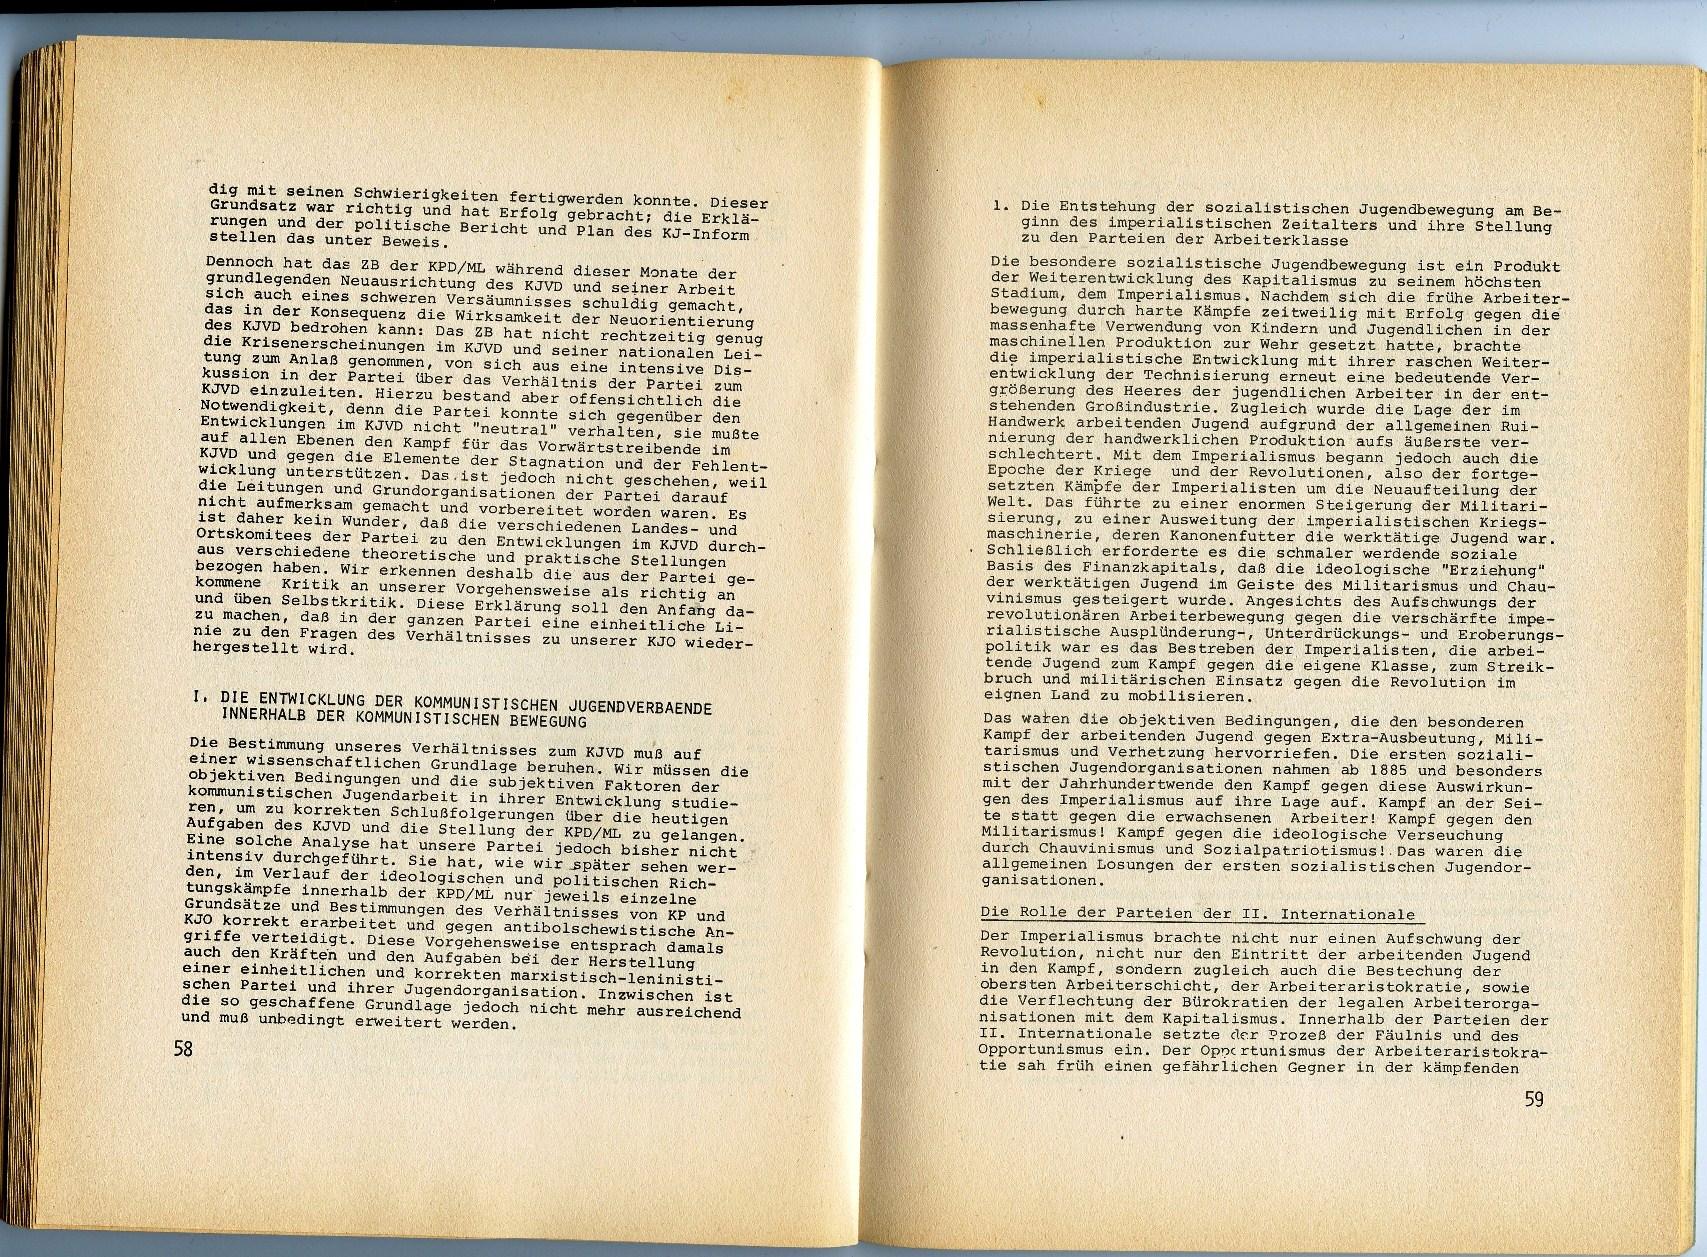 ZB_Parteiarbeiter_1971_08_31